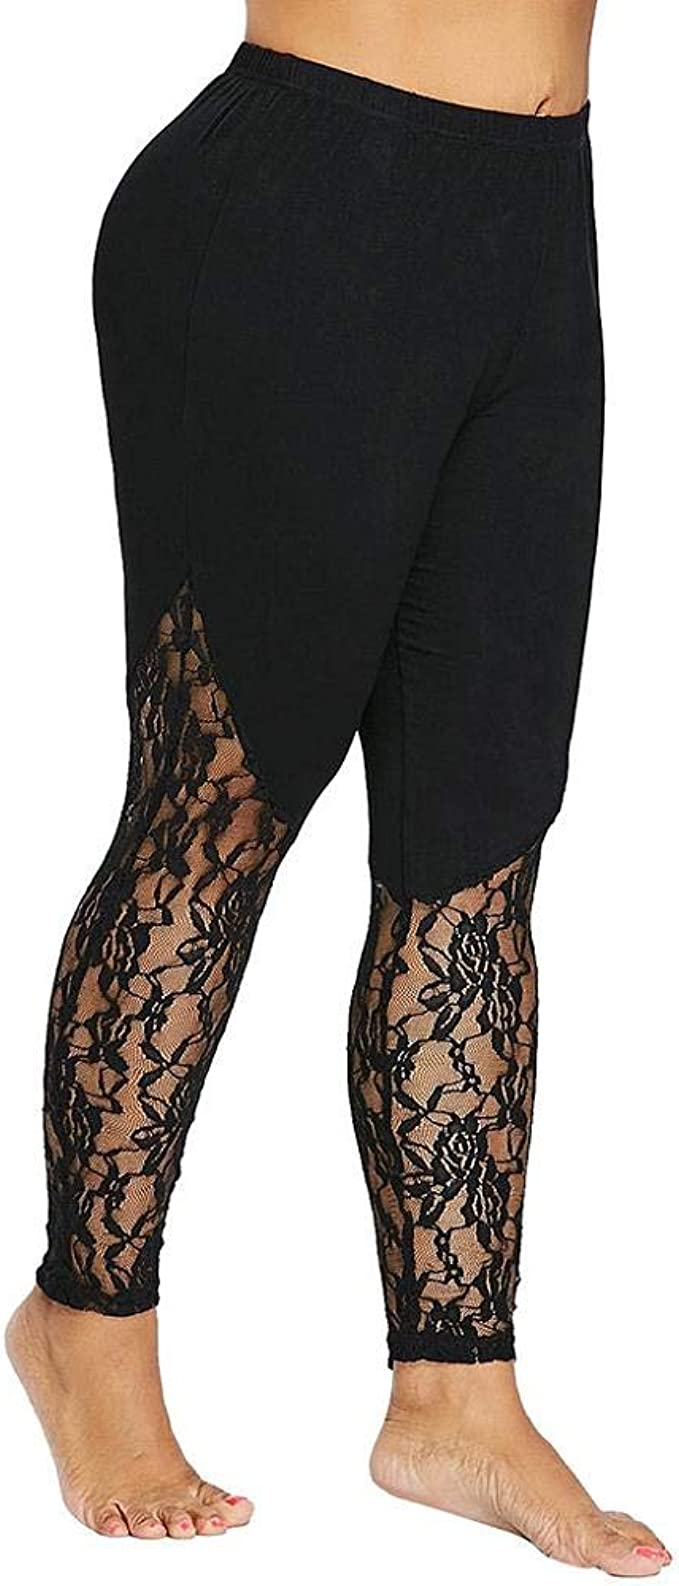 ZZpioneer Womens Casual Print Leggings Sports Workout Pants Lounge Yoga Athletic Pants Trouser